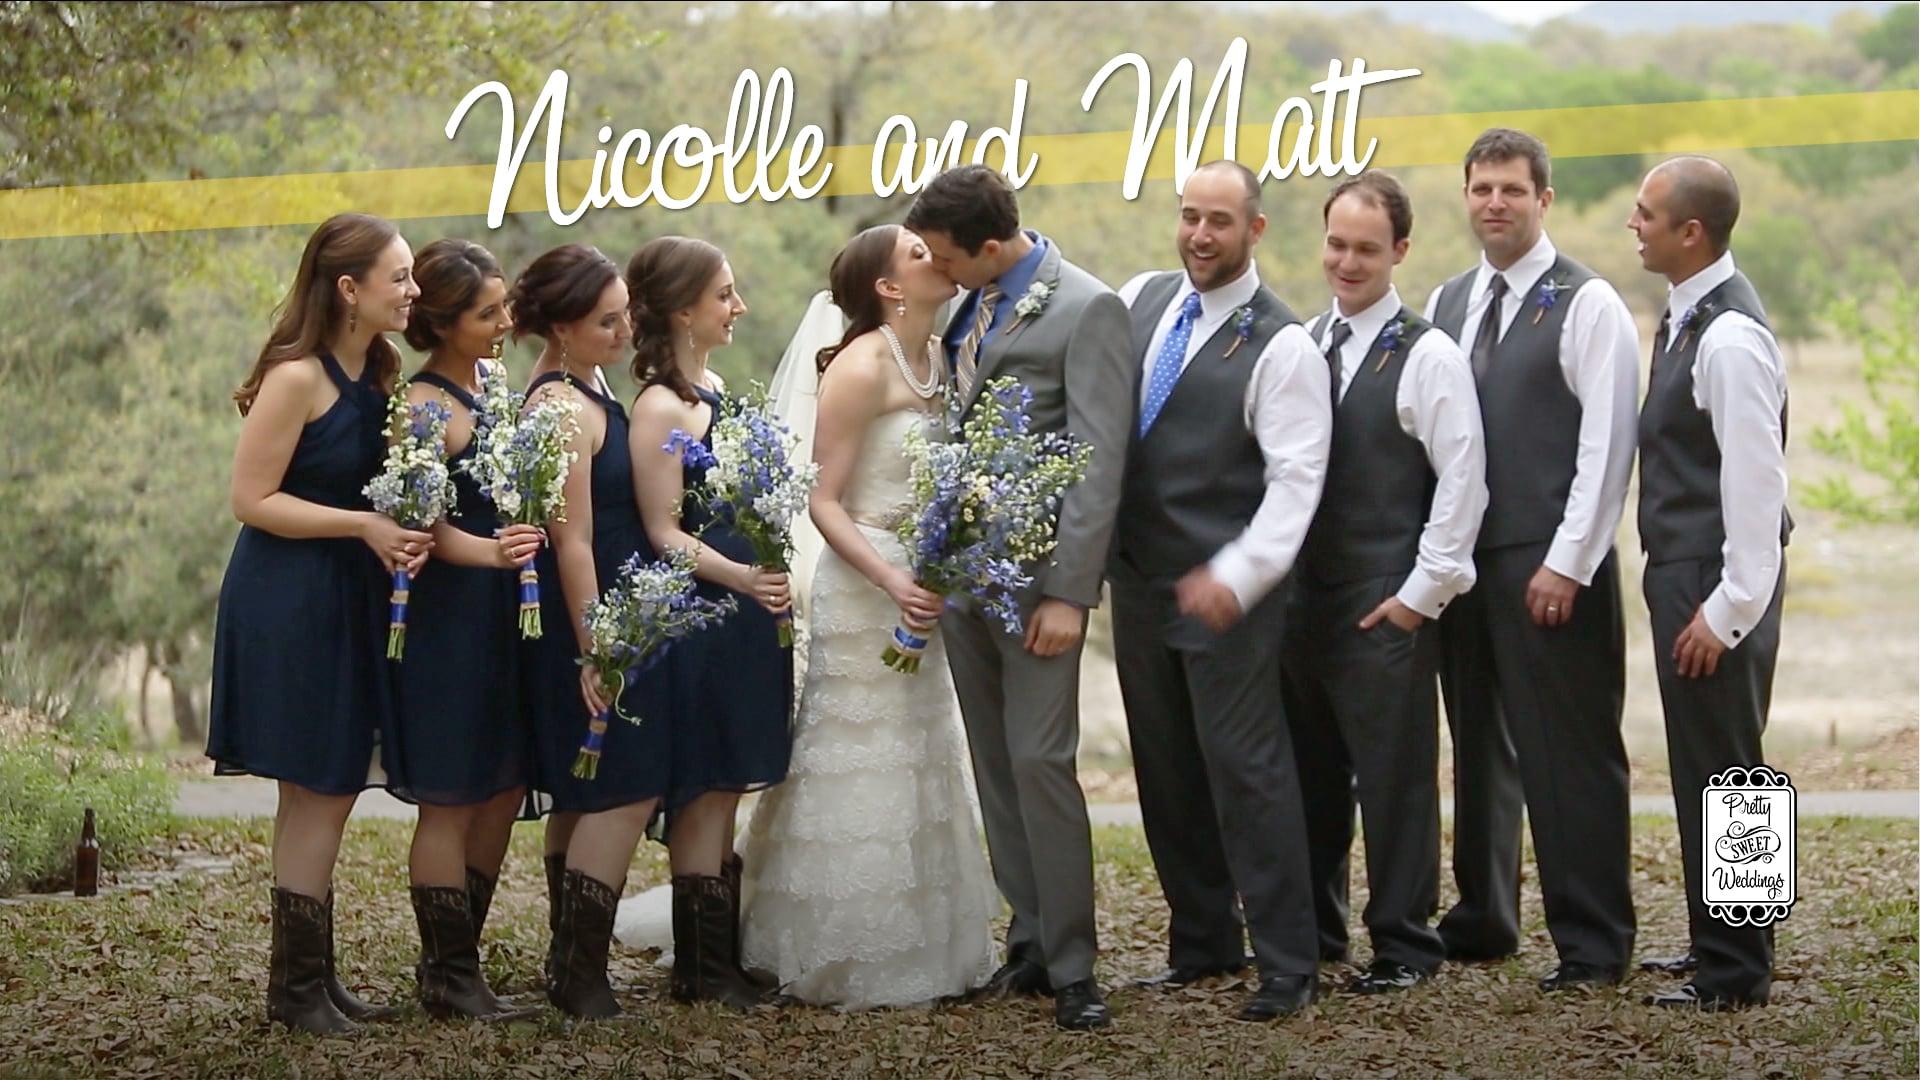 Paniolo Ranch: Nicolle & Matt